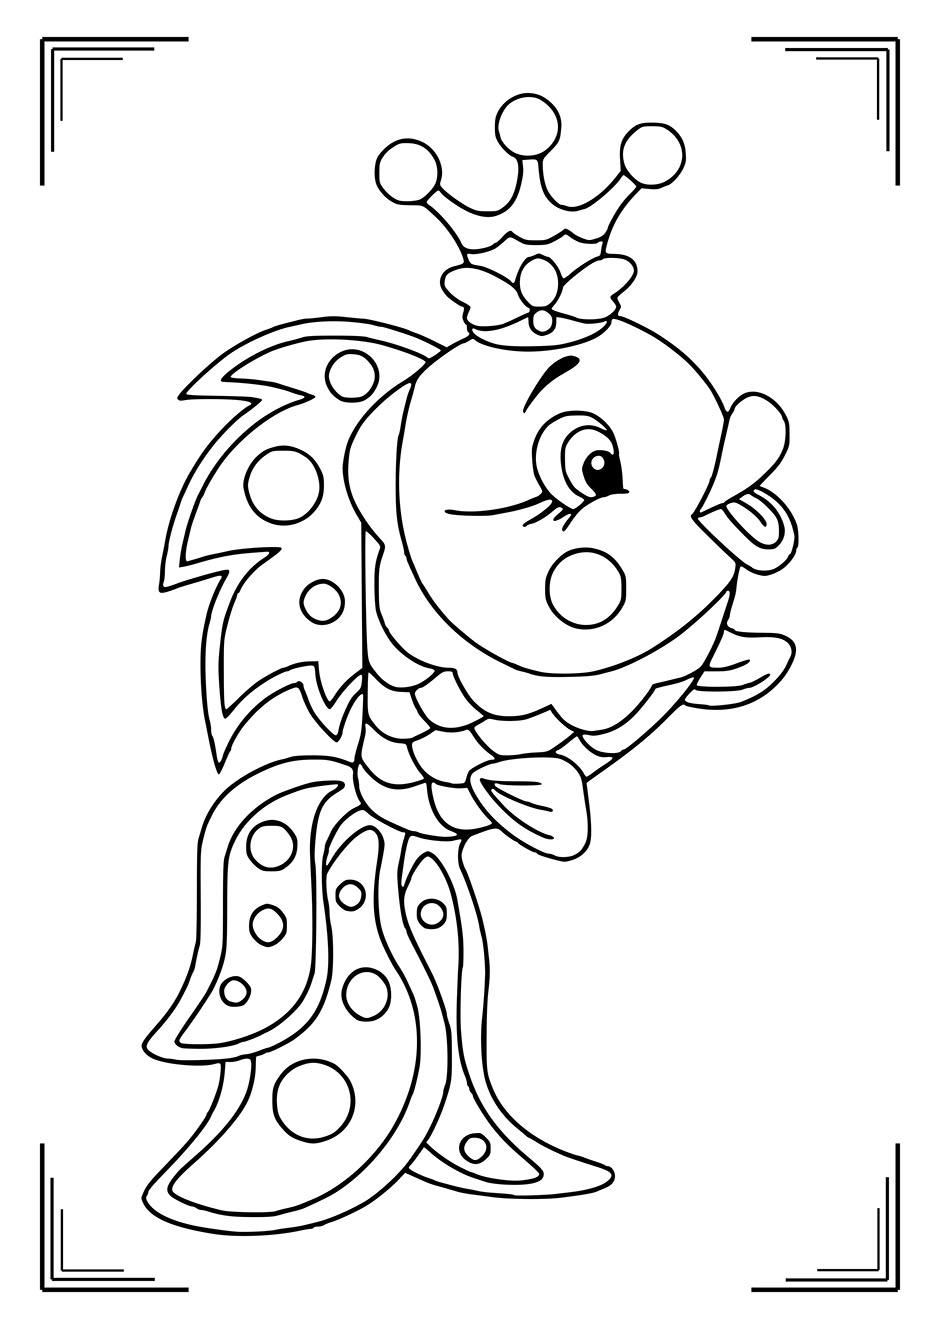 Раскраска: рыбка с короной на голове — raskraski-a4.ru